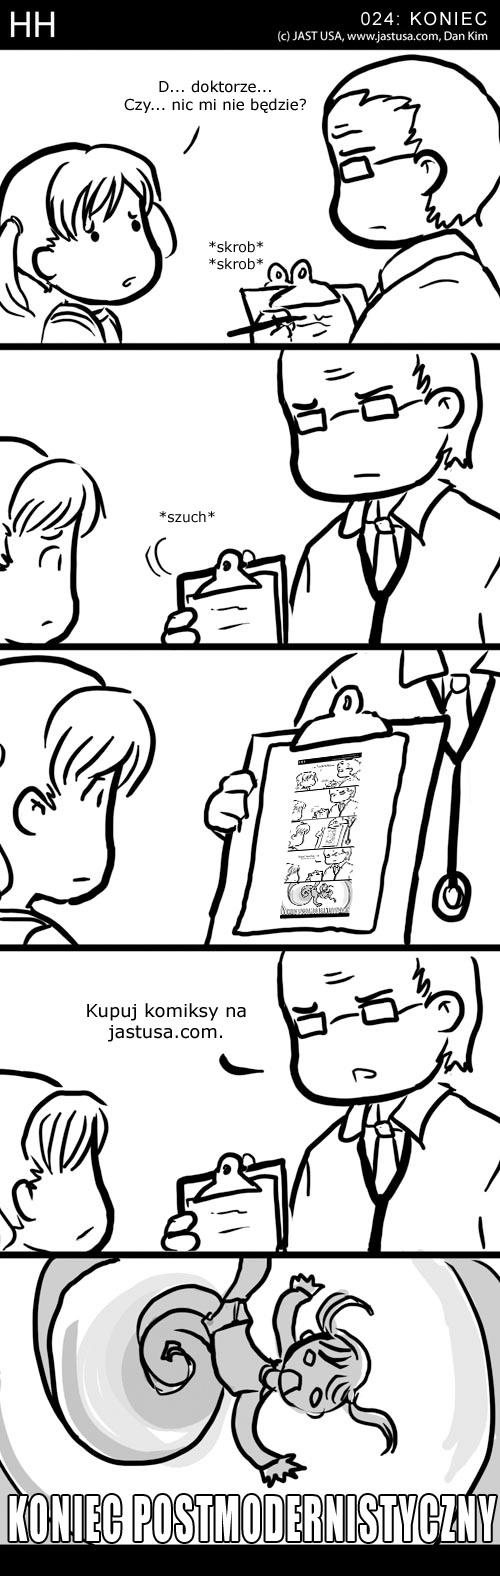 [HH - strip 24]